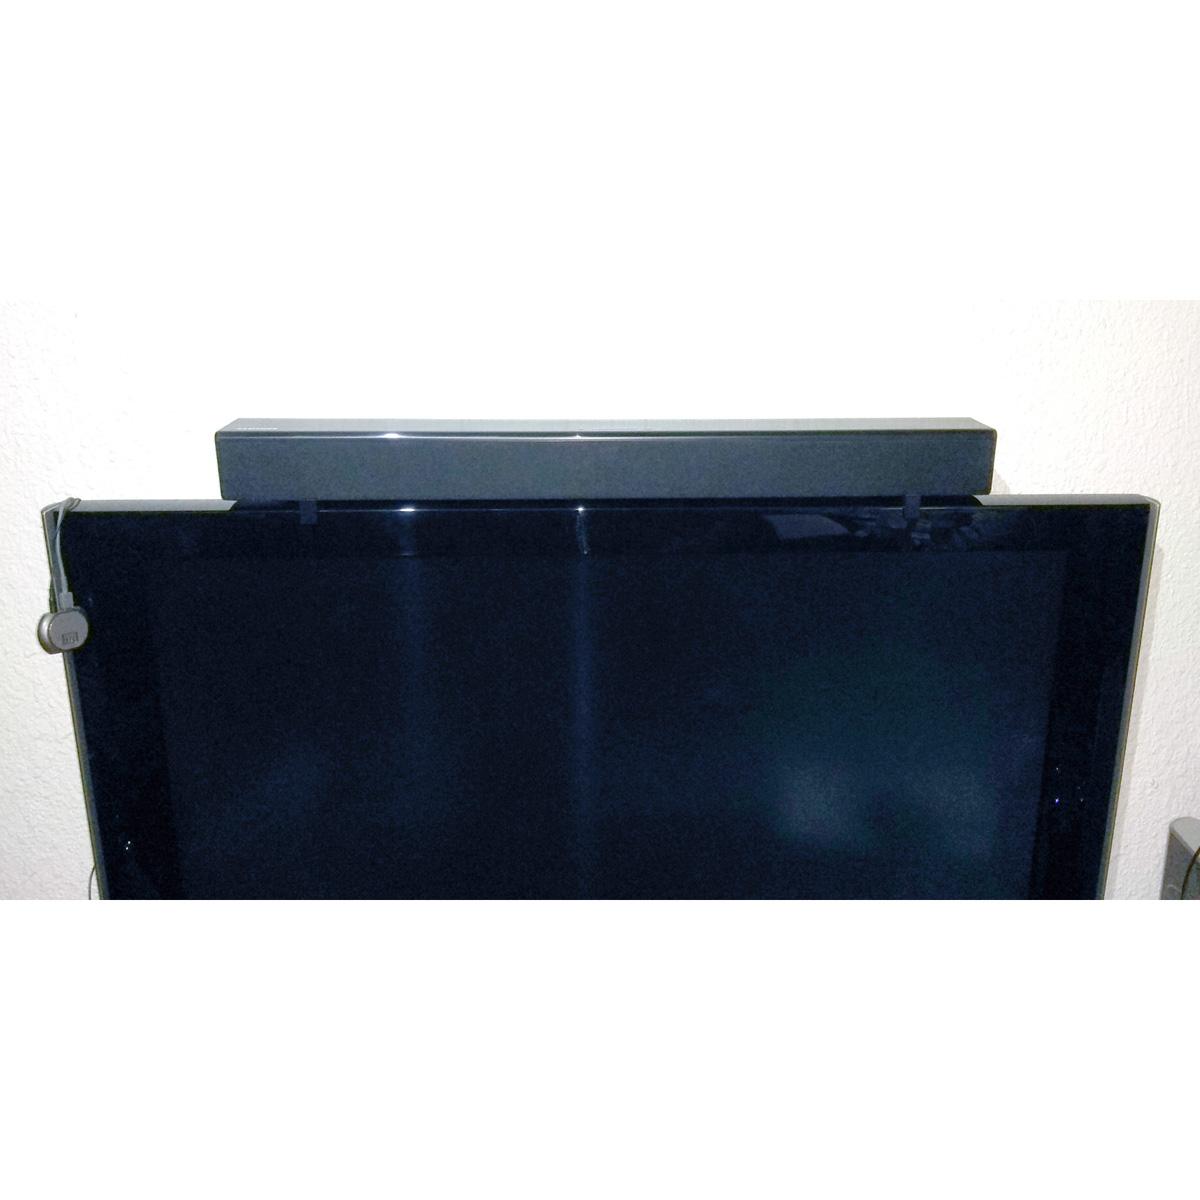 Soundbar_4.jpg Download free STL file Samsung Soundbar Holders (for Samsung TV) • 3D printing object, HowardB